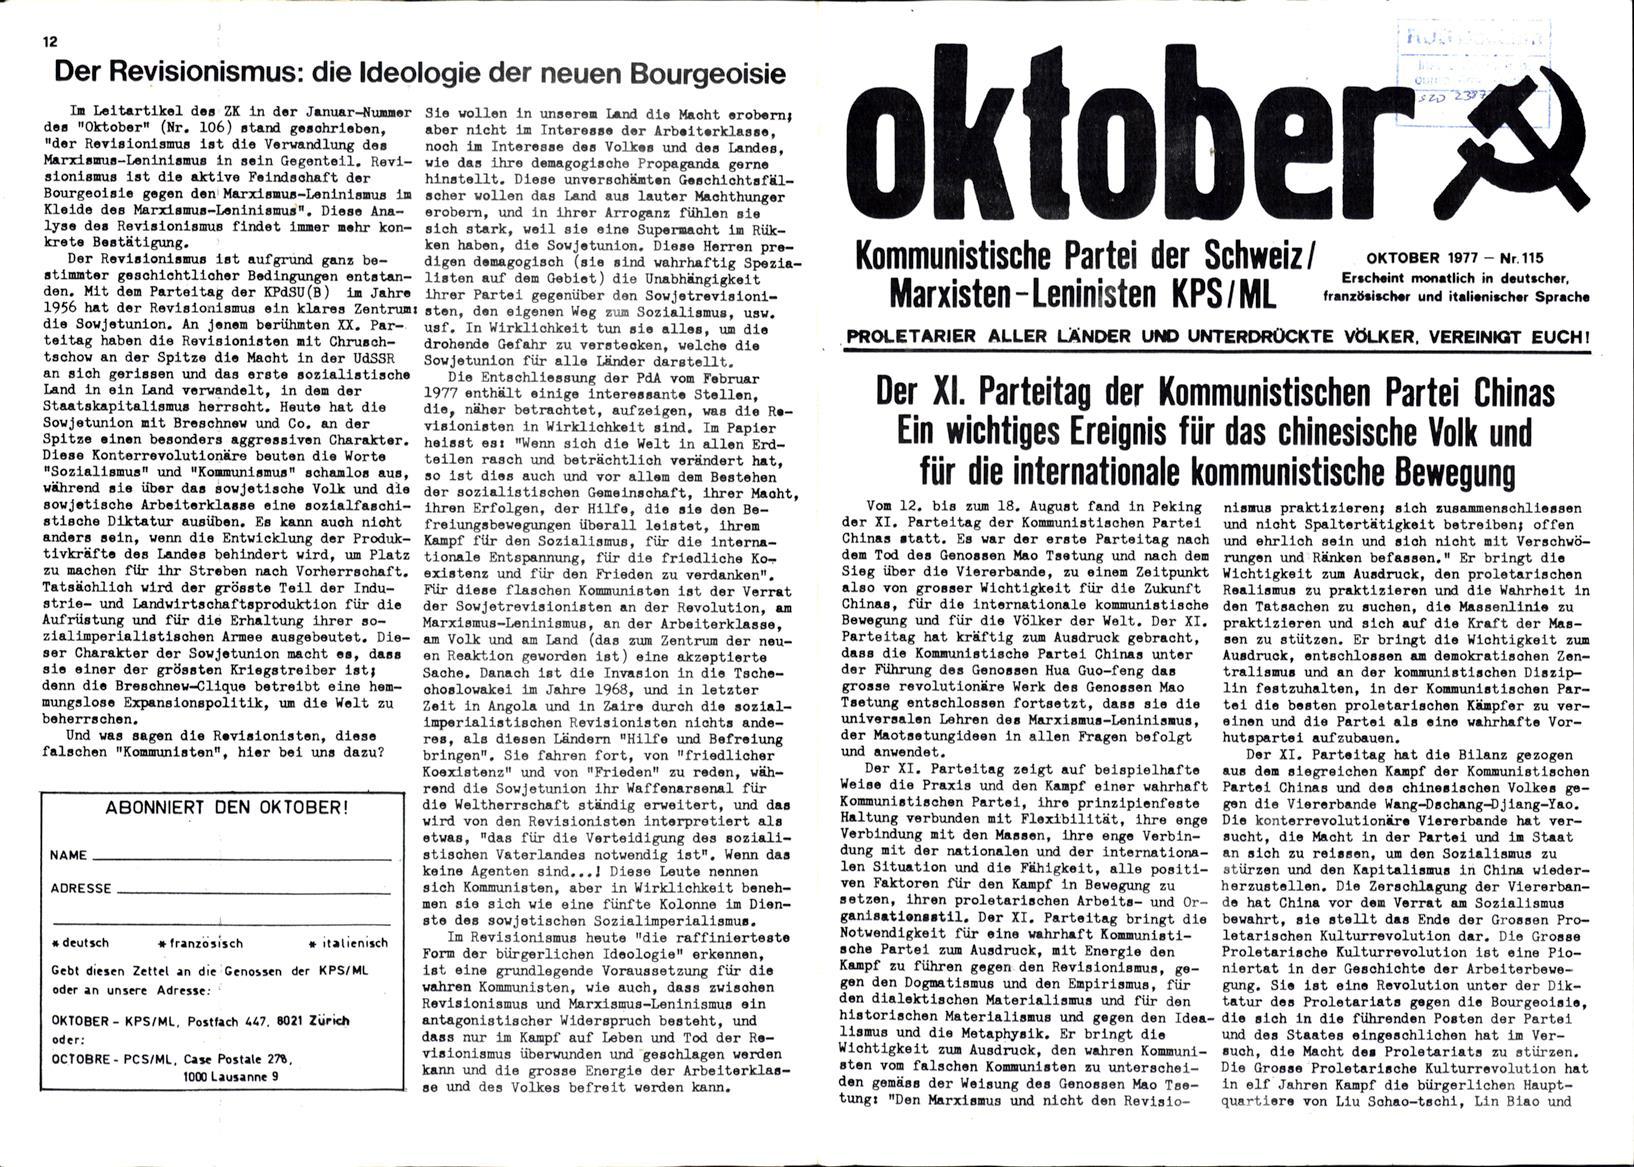 Schweiz_KPSML_Oktober_19771000_115_001